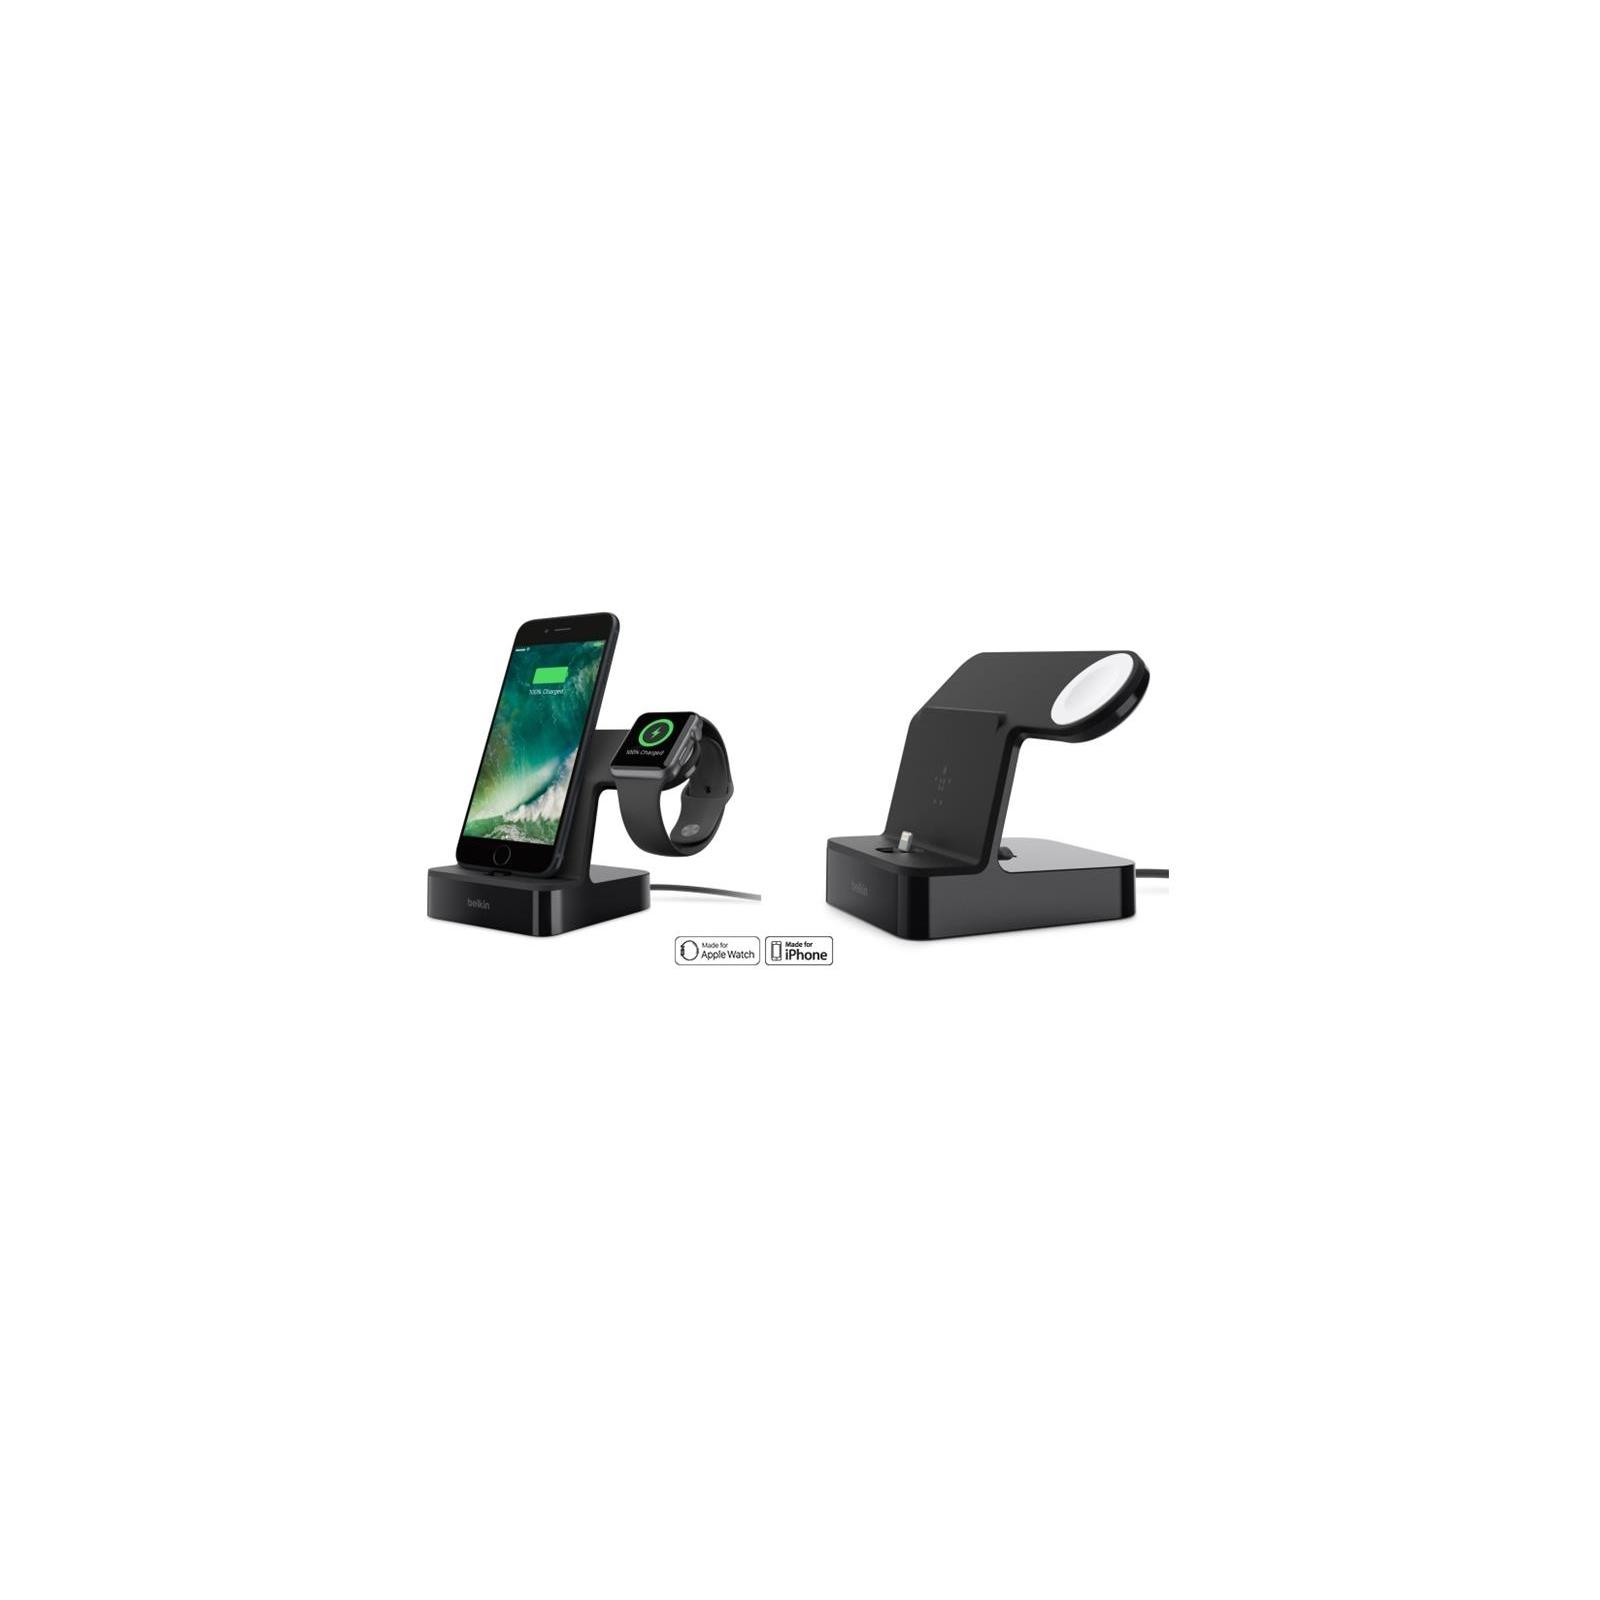 Док-станция Belkin PowerHouse iWatch + iPhone, black (F8J200vfBLK) изображение 3